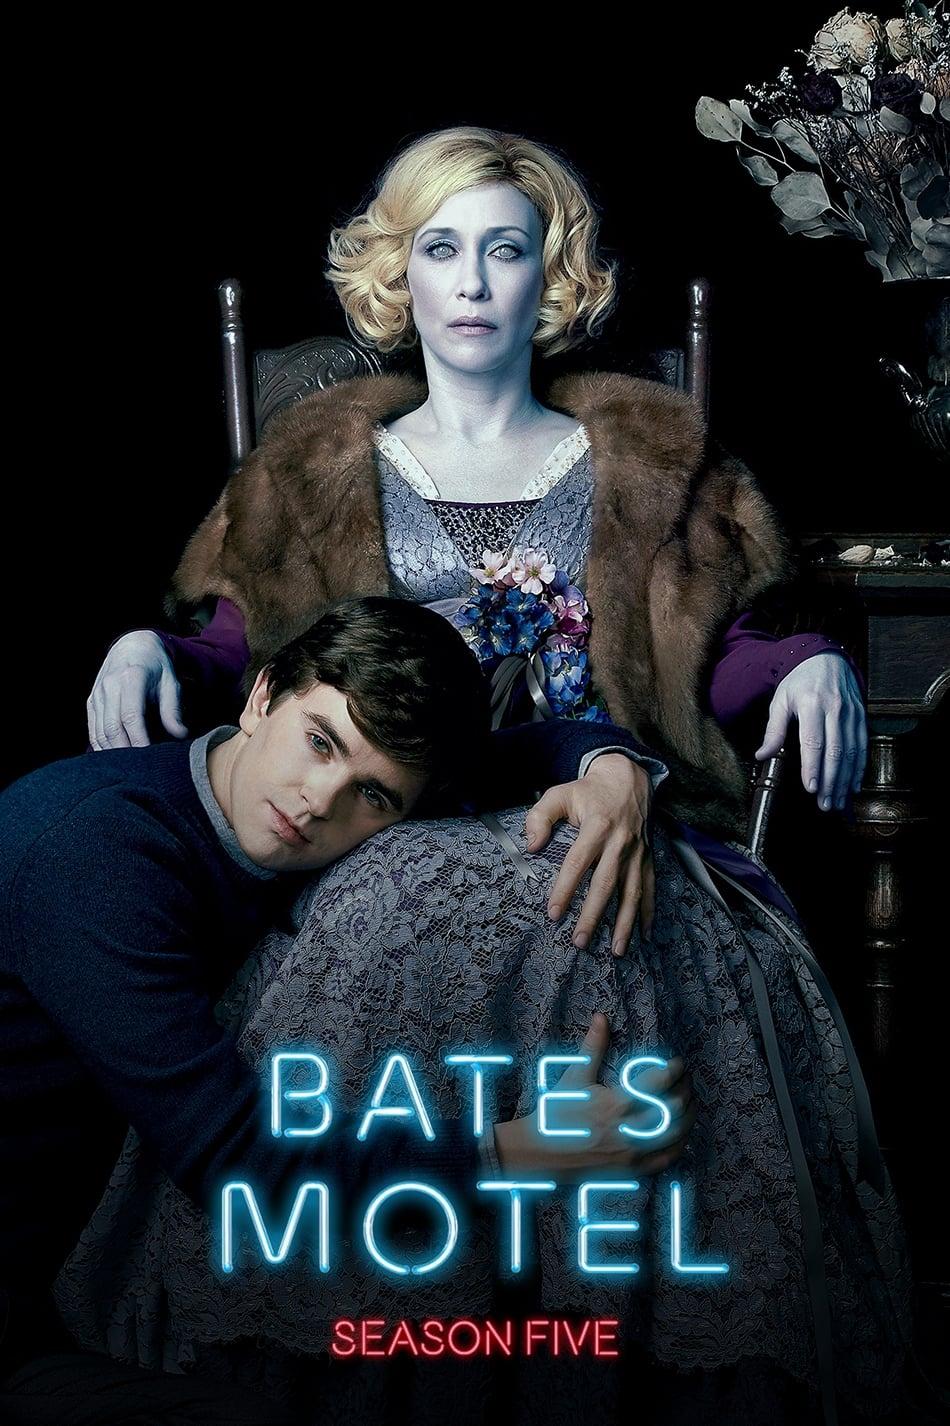 Bates Motel Season 5 ซับไทย ตอนที่ 1-10